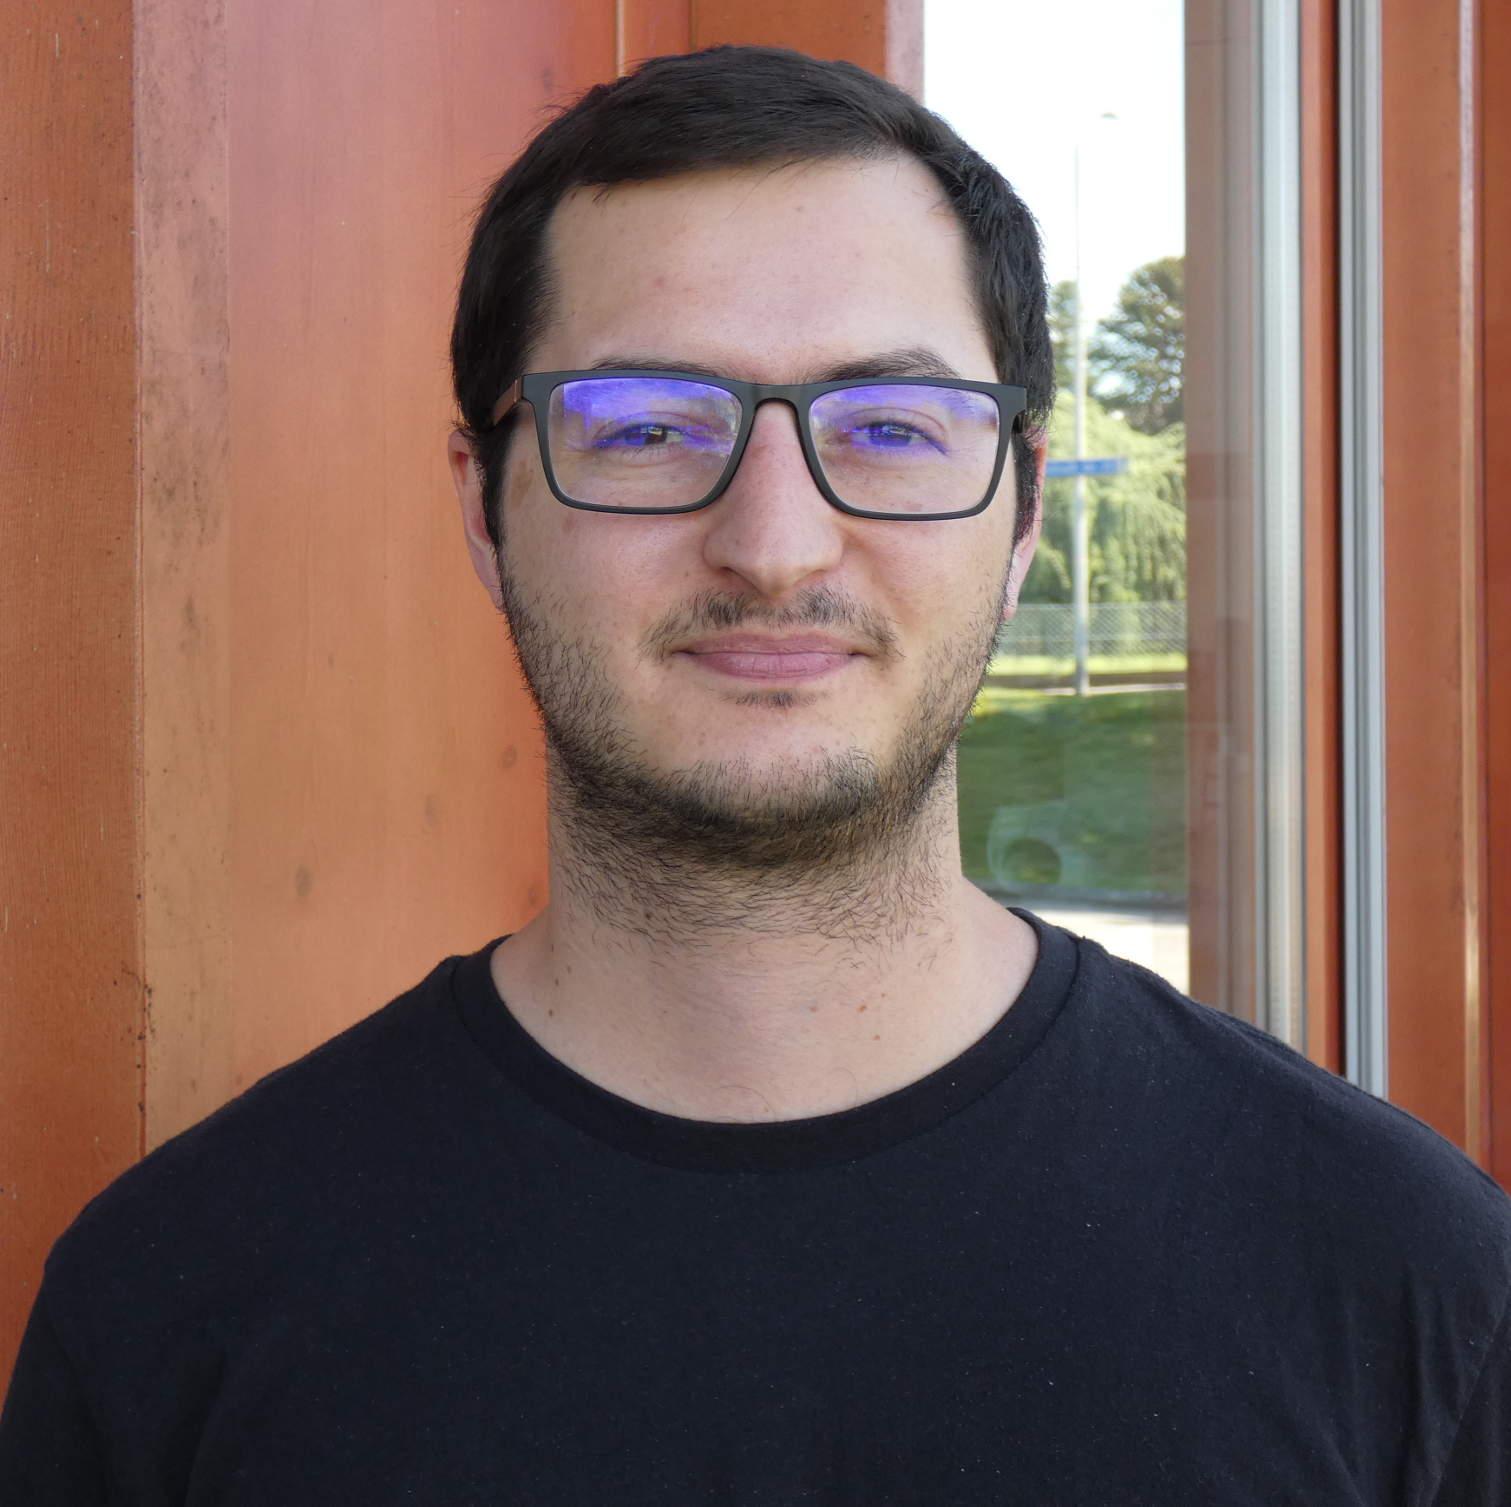 João Pedro, MSc in Photonics